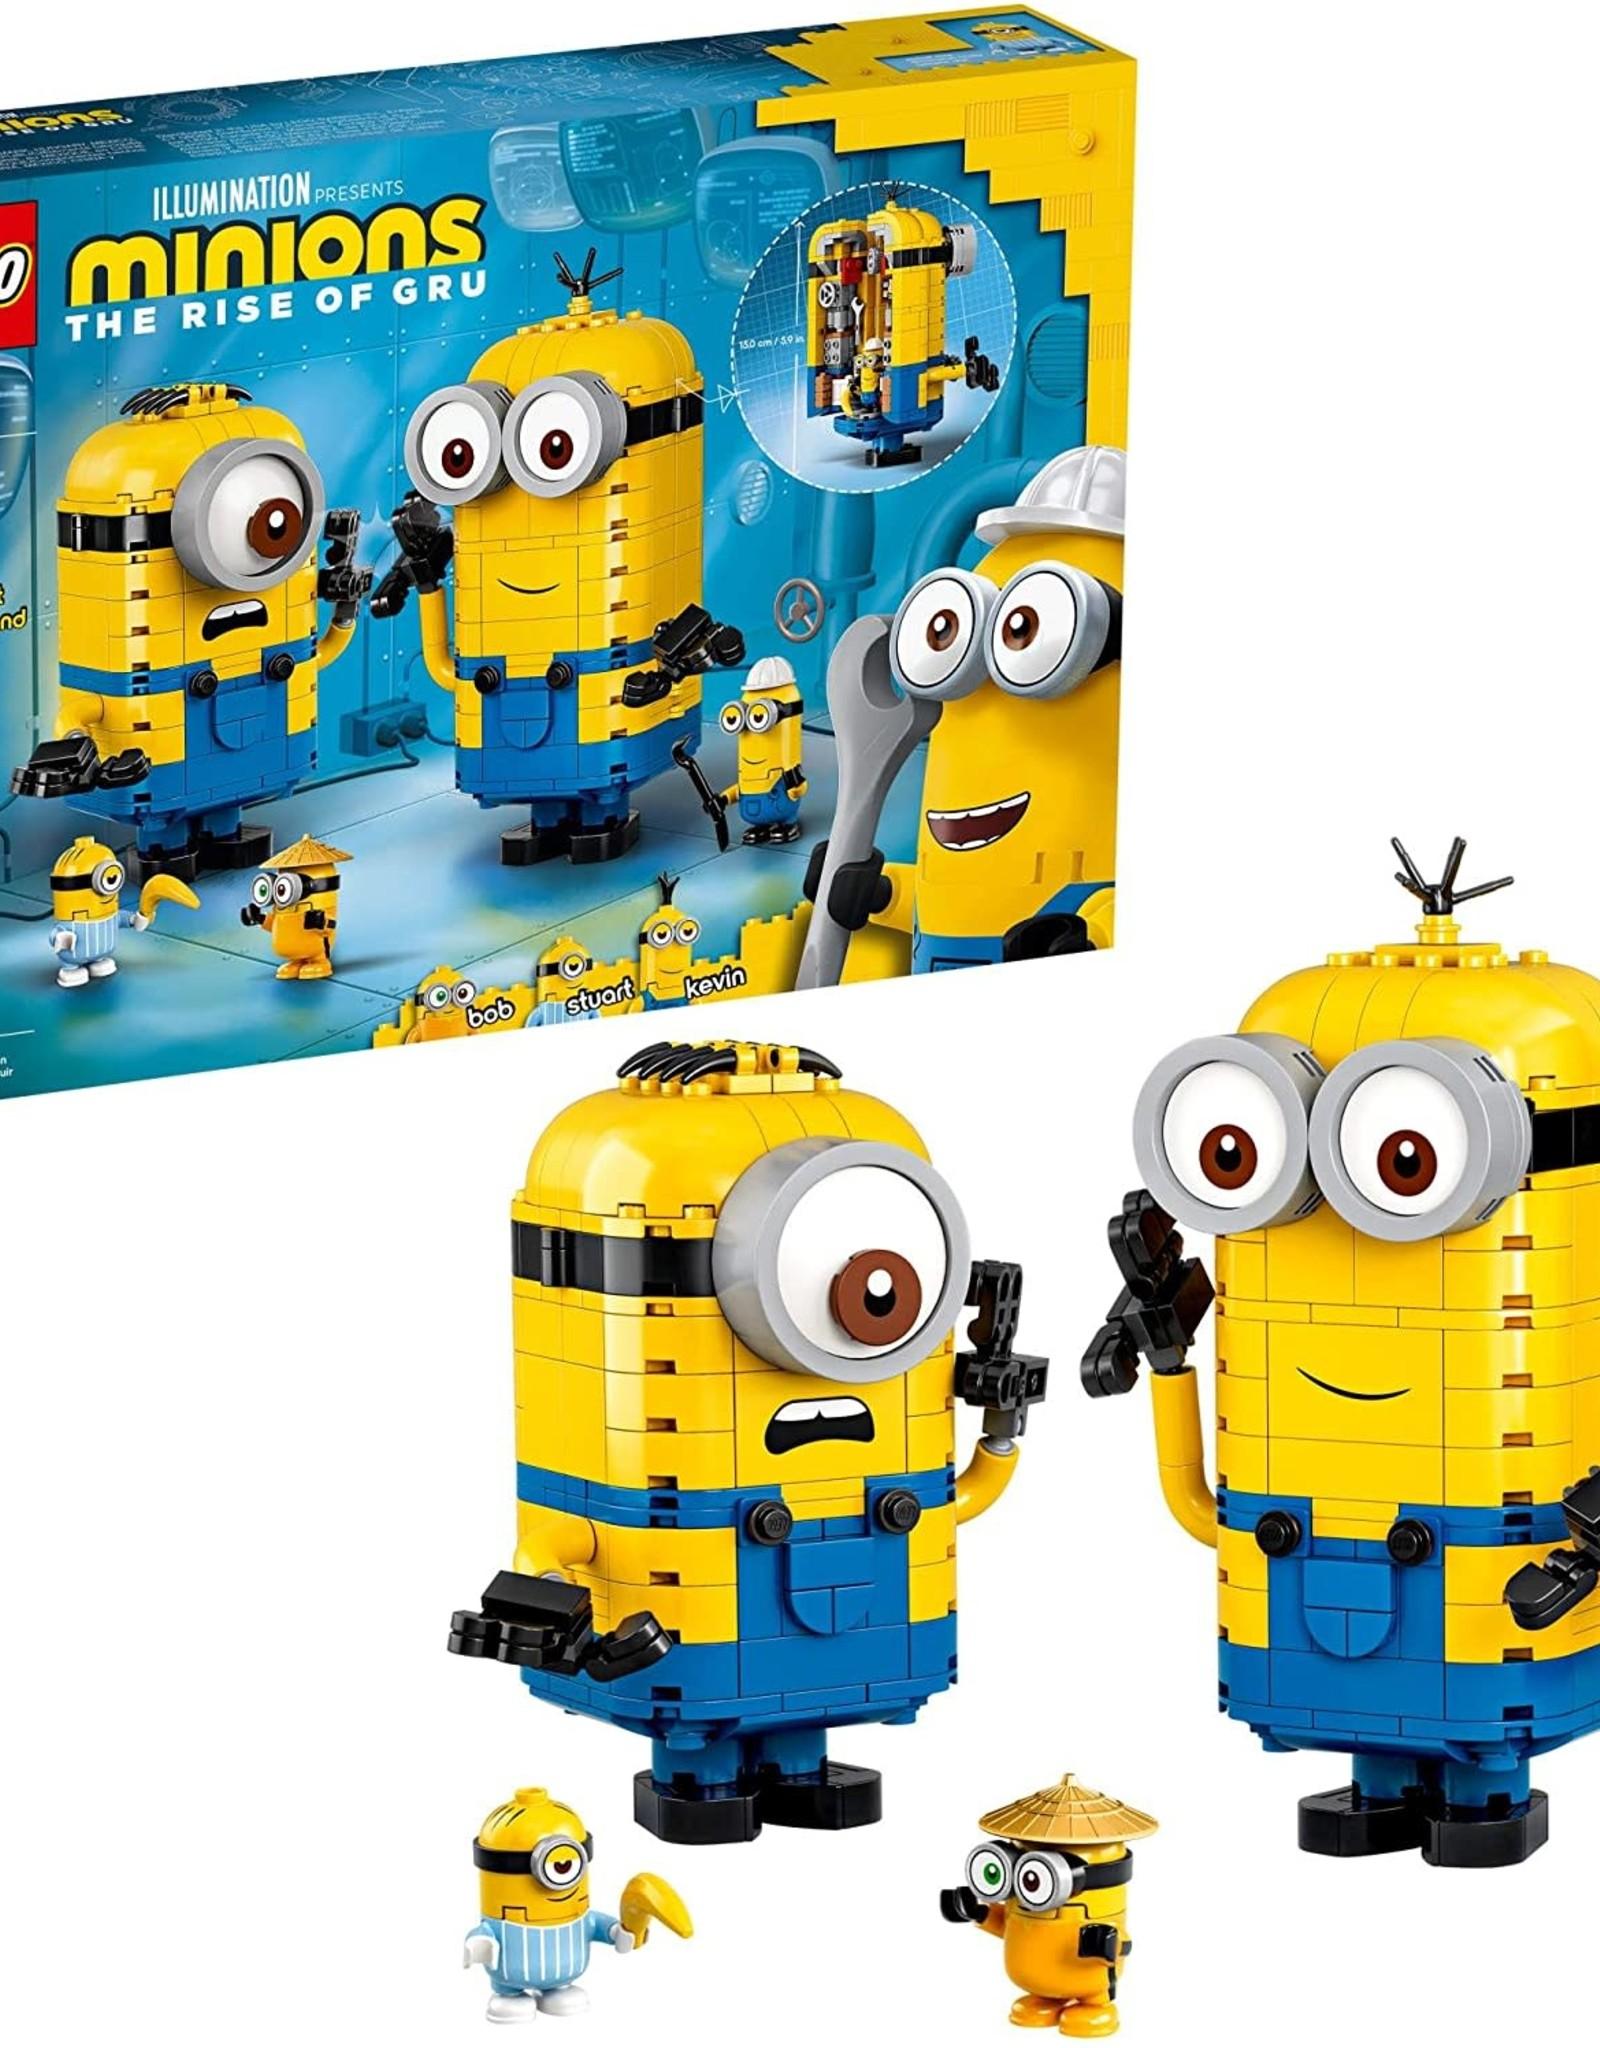 LEGO 75551 Brick-built Minions and their Lair